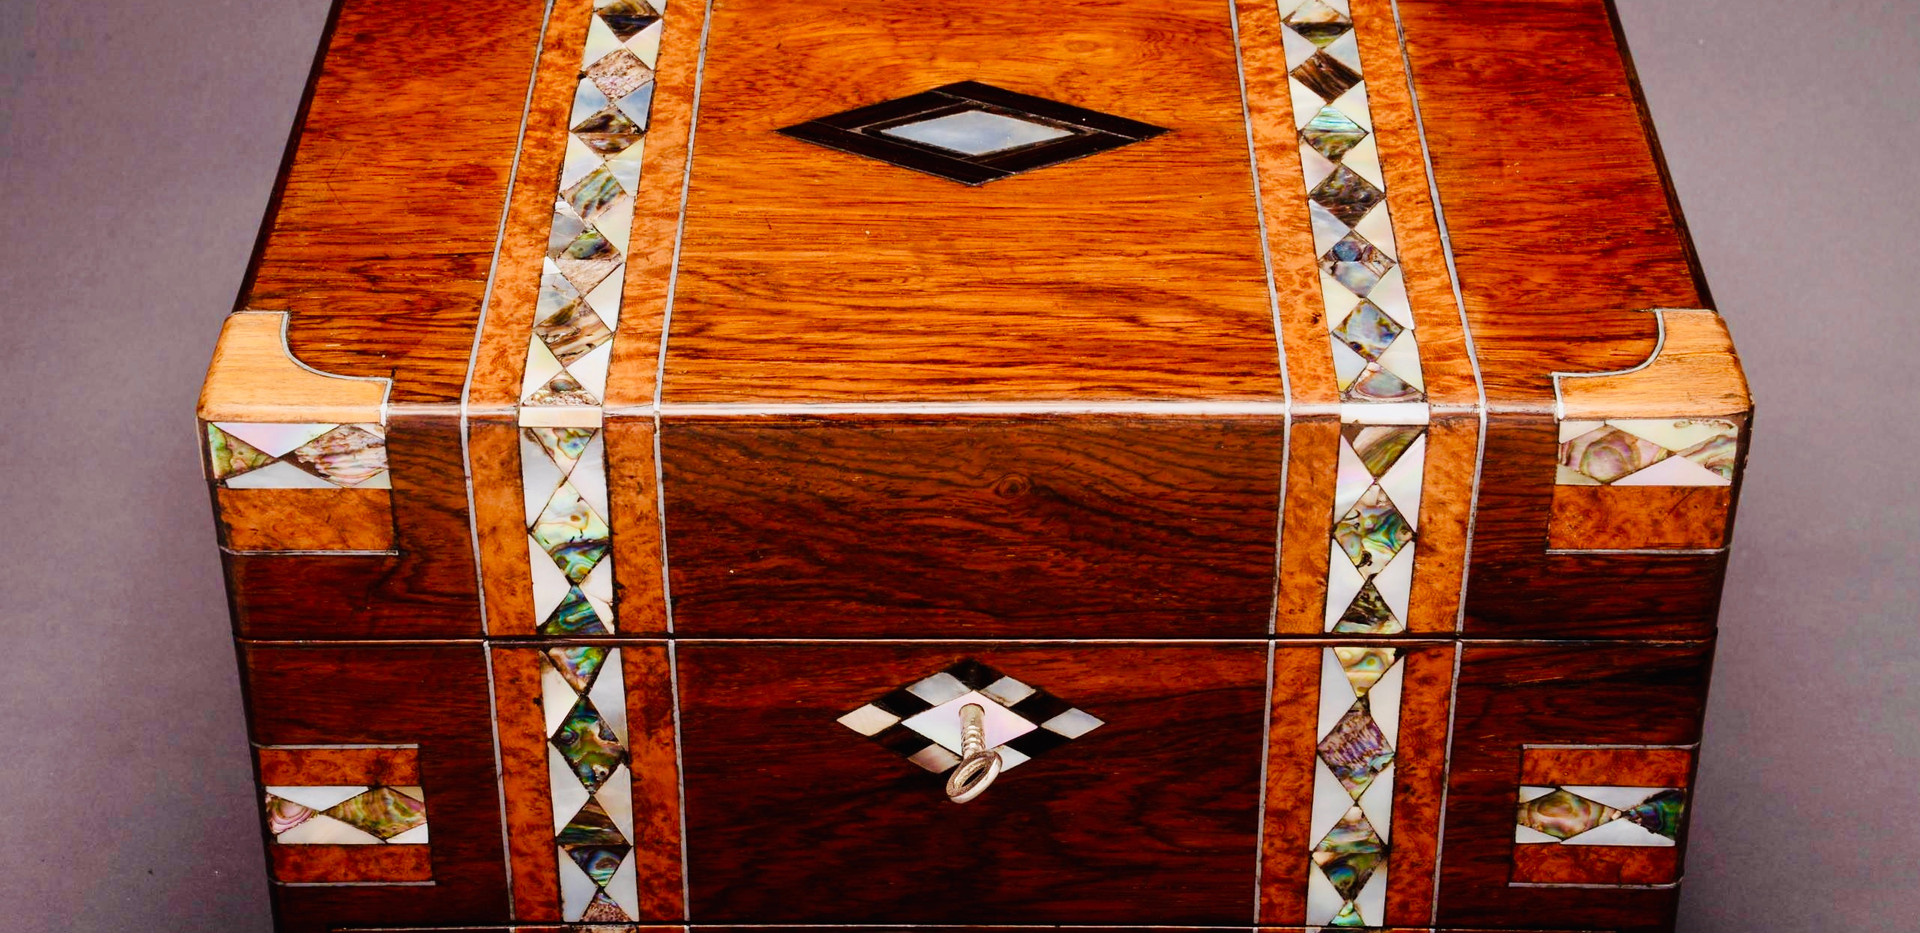 Rosewood Inlaid Box